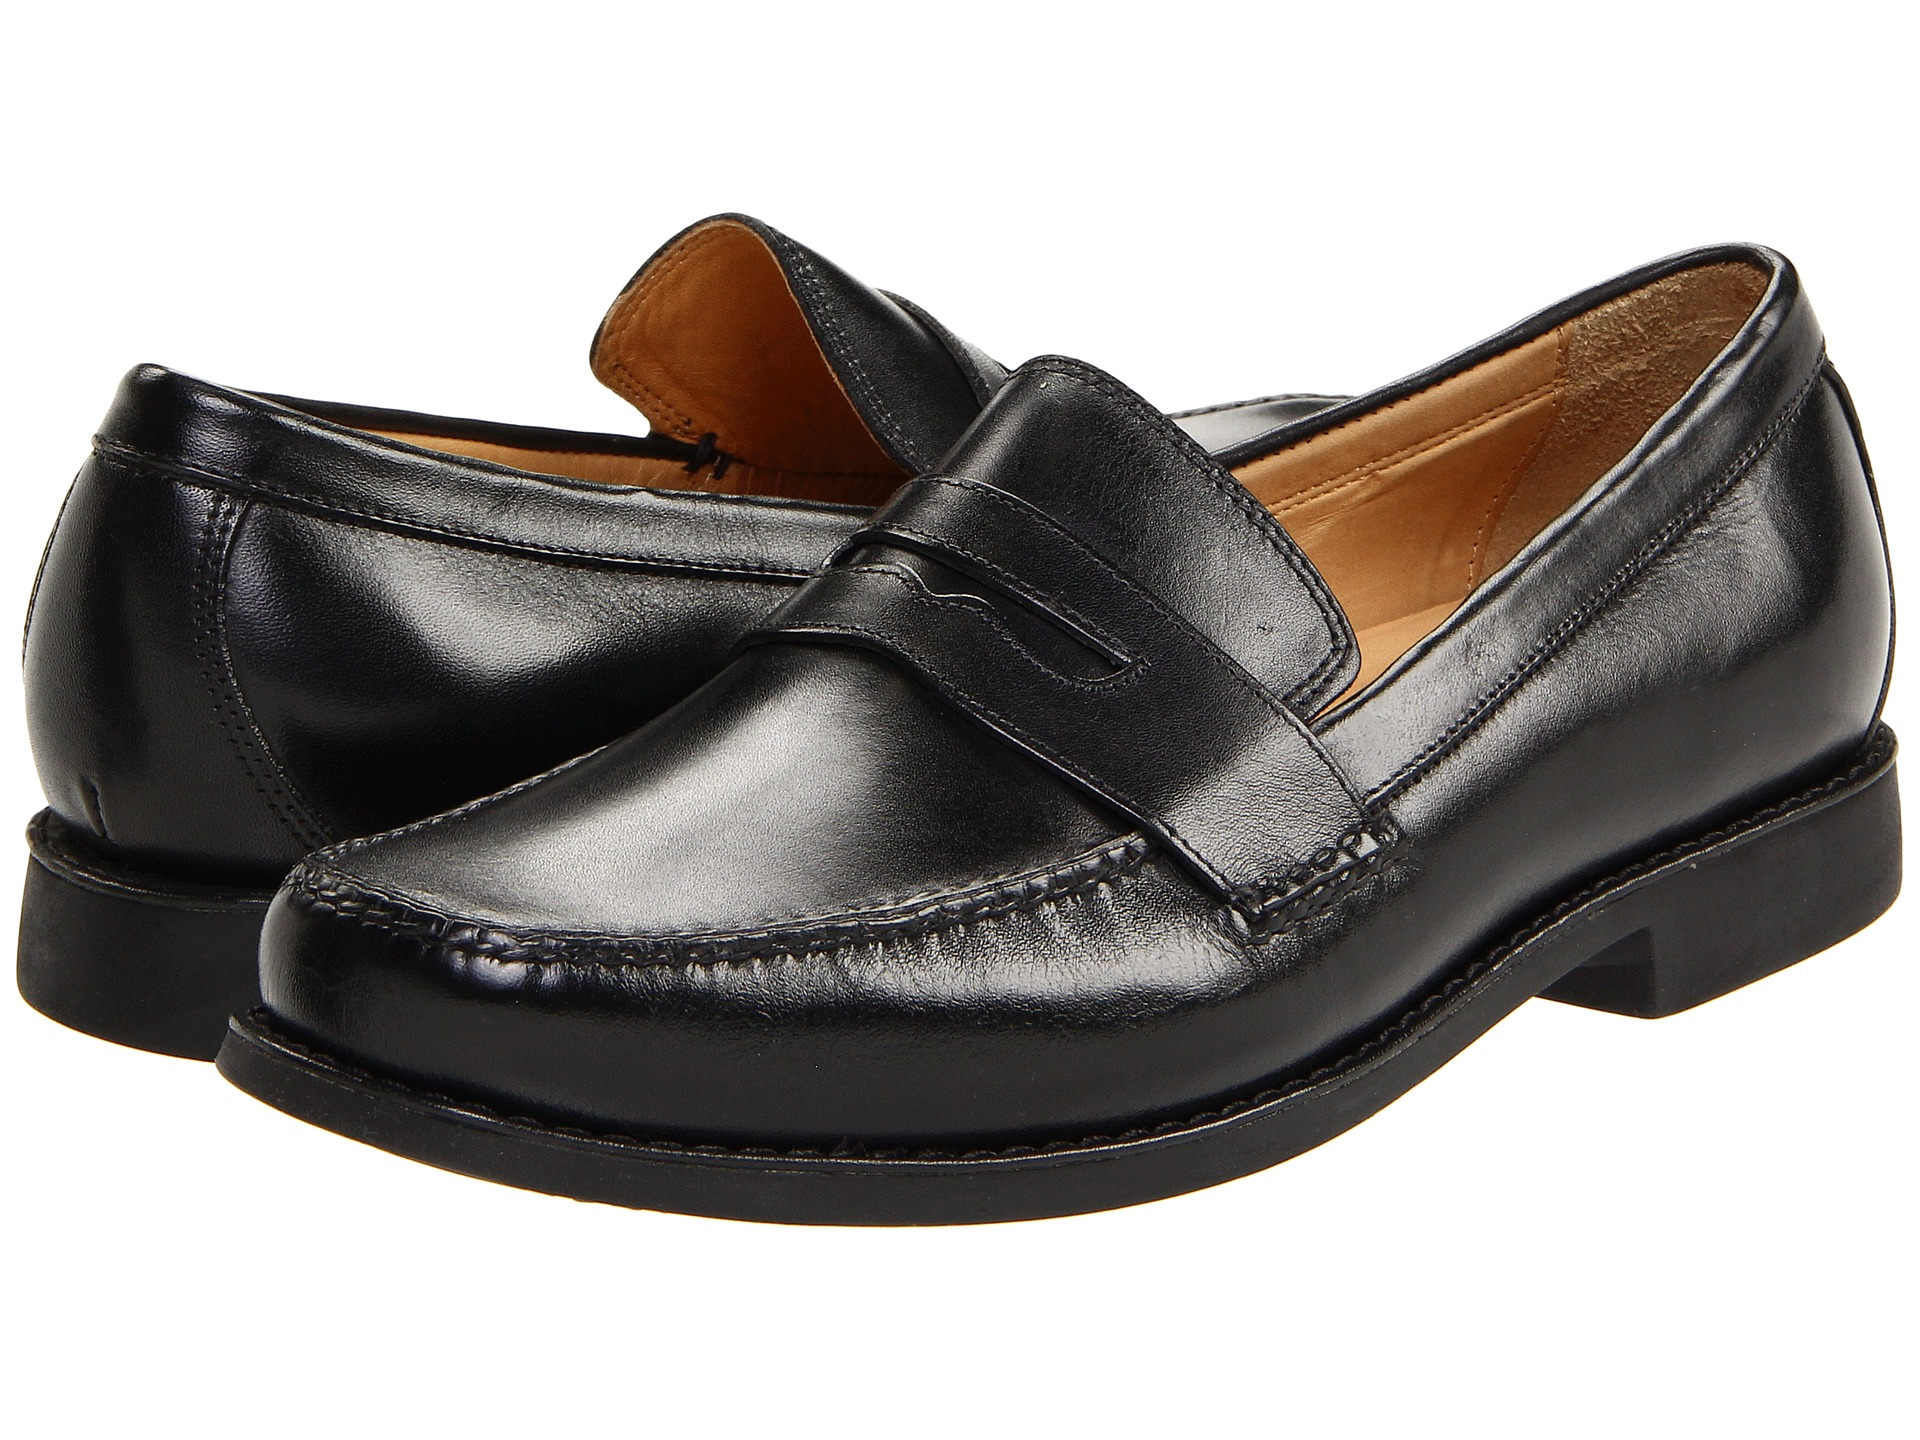 J Murphy Shoes Reviews